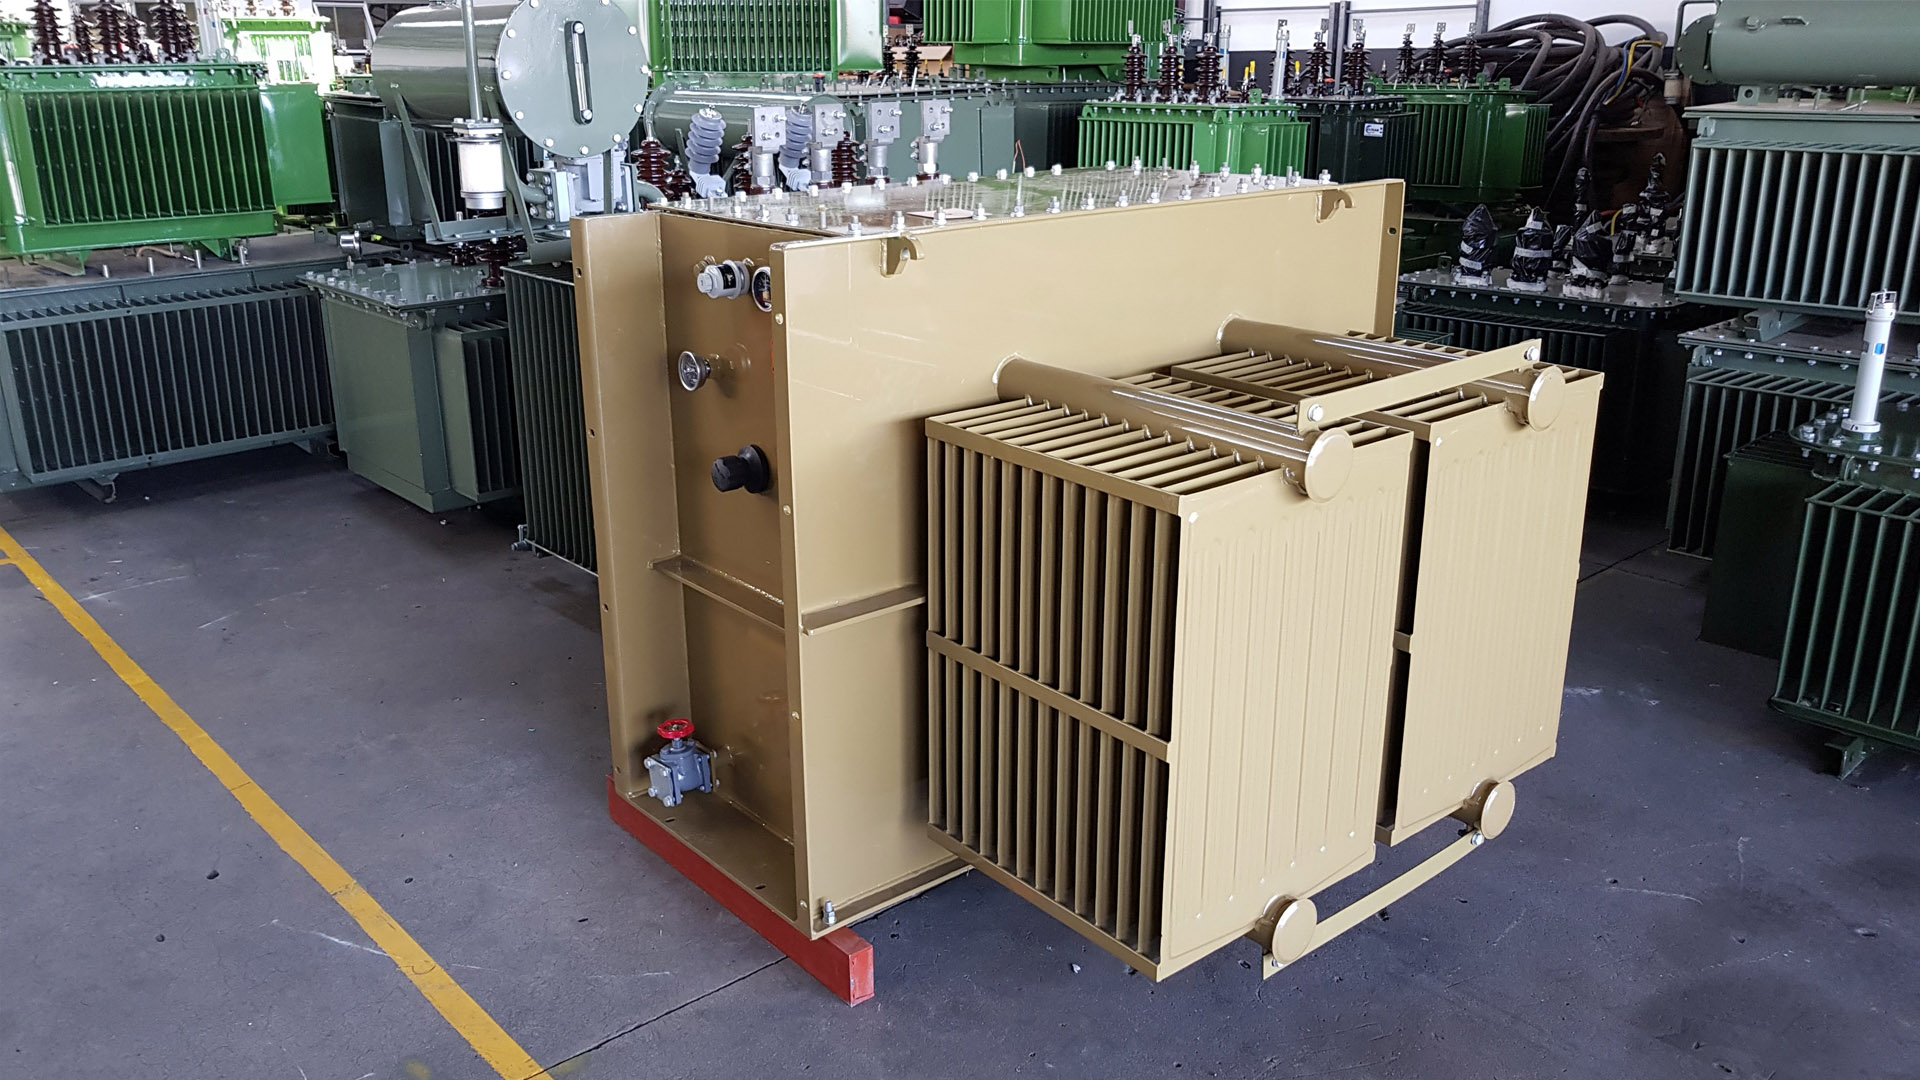 400kVA/11kV/400V Minisub Transformer